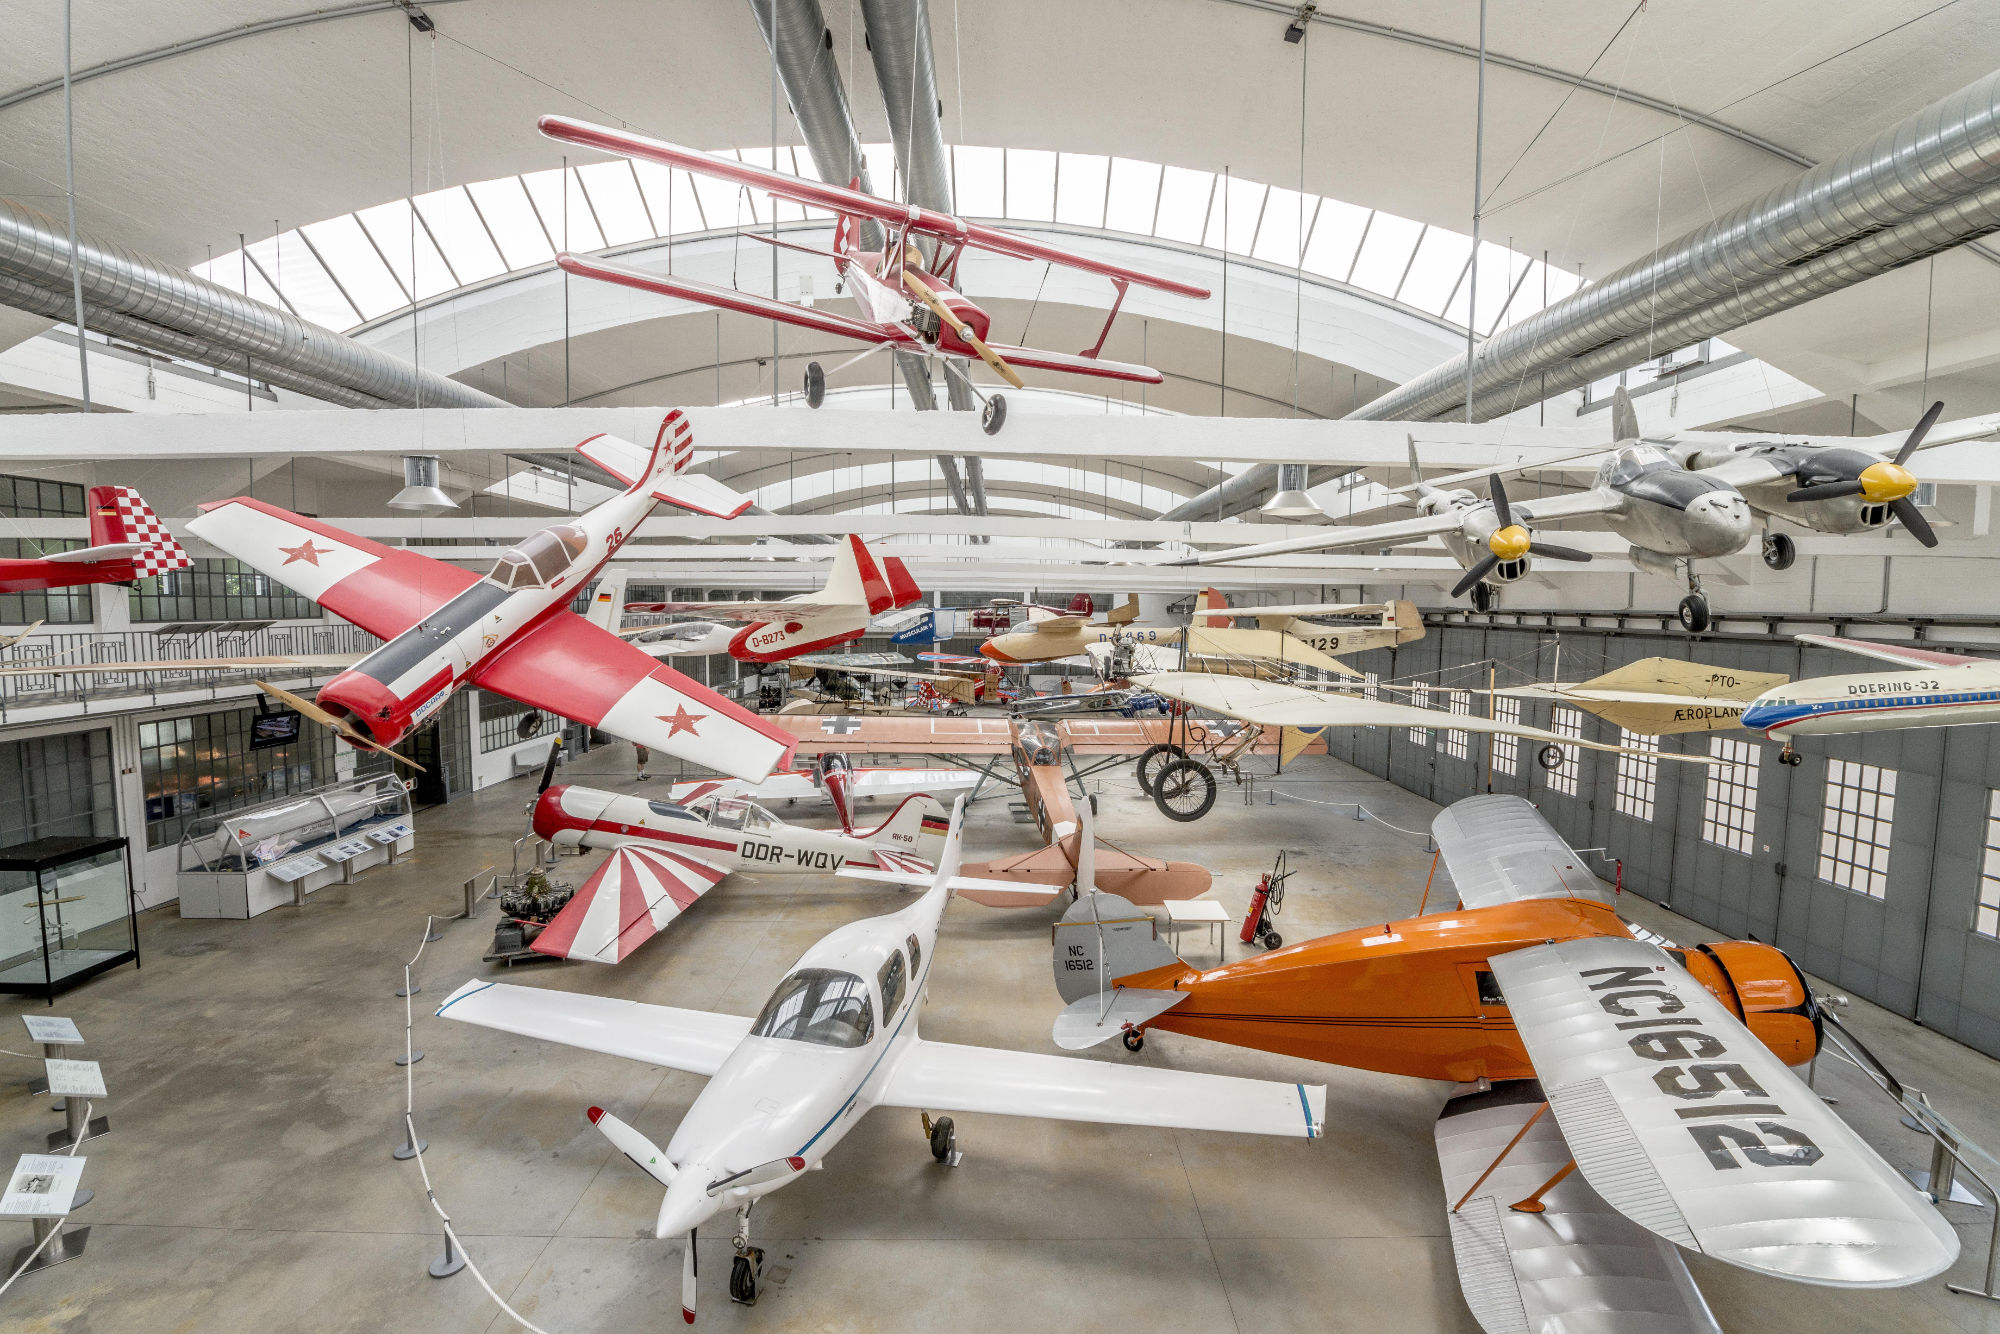 Flugwerft Schleißheim Aircraft hangar